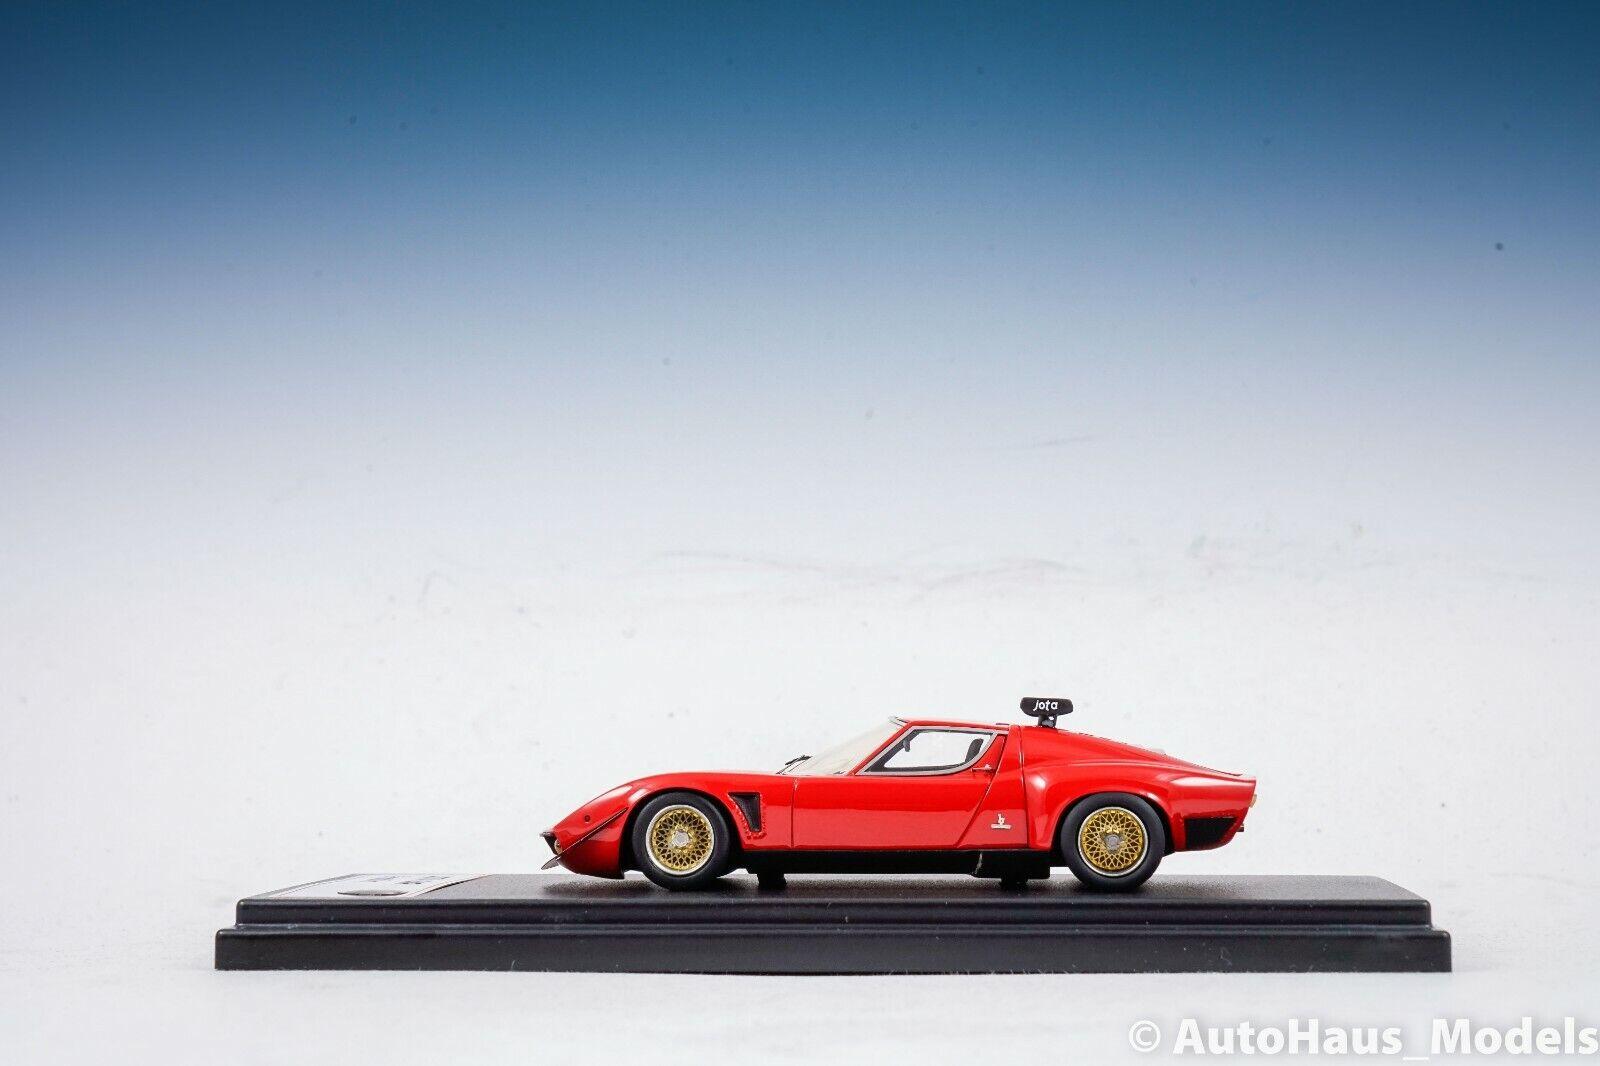 1 43 FRONTIART Lamborghini Miura Jota SVR rosso RARE